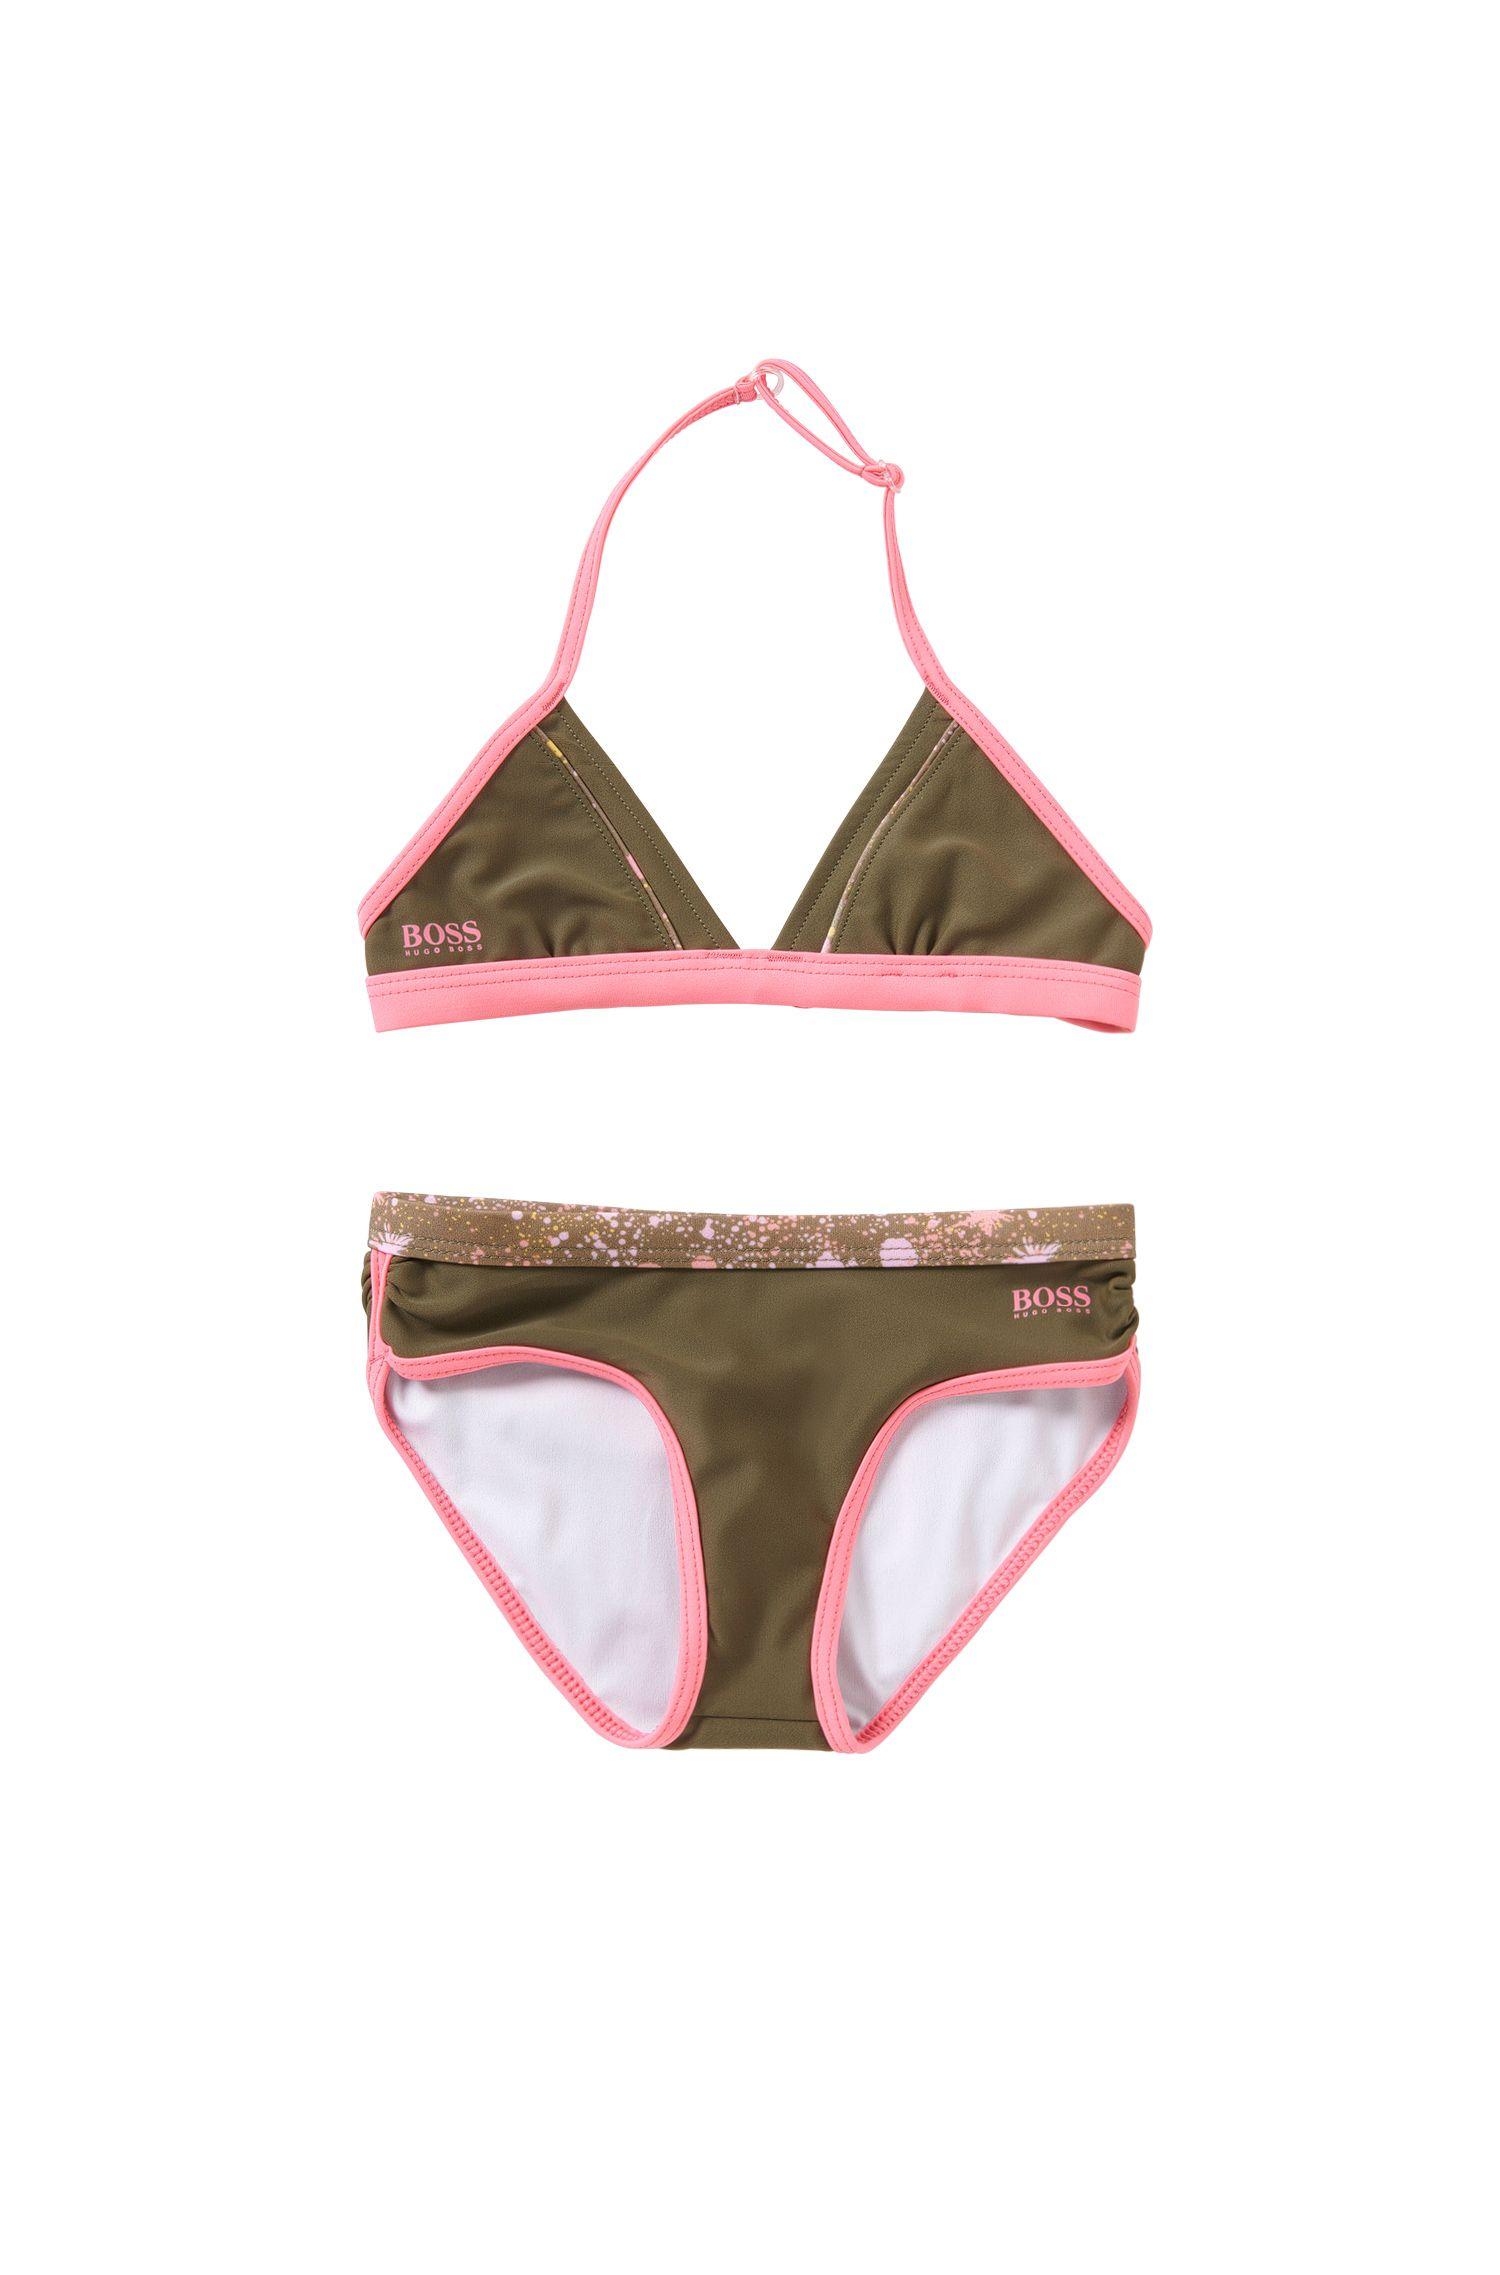 'J10096' |  Girls Stretch Cotton 2-Piece Bathing Suit